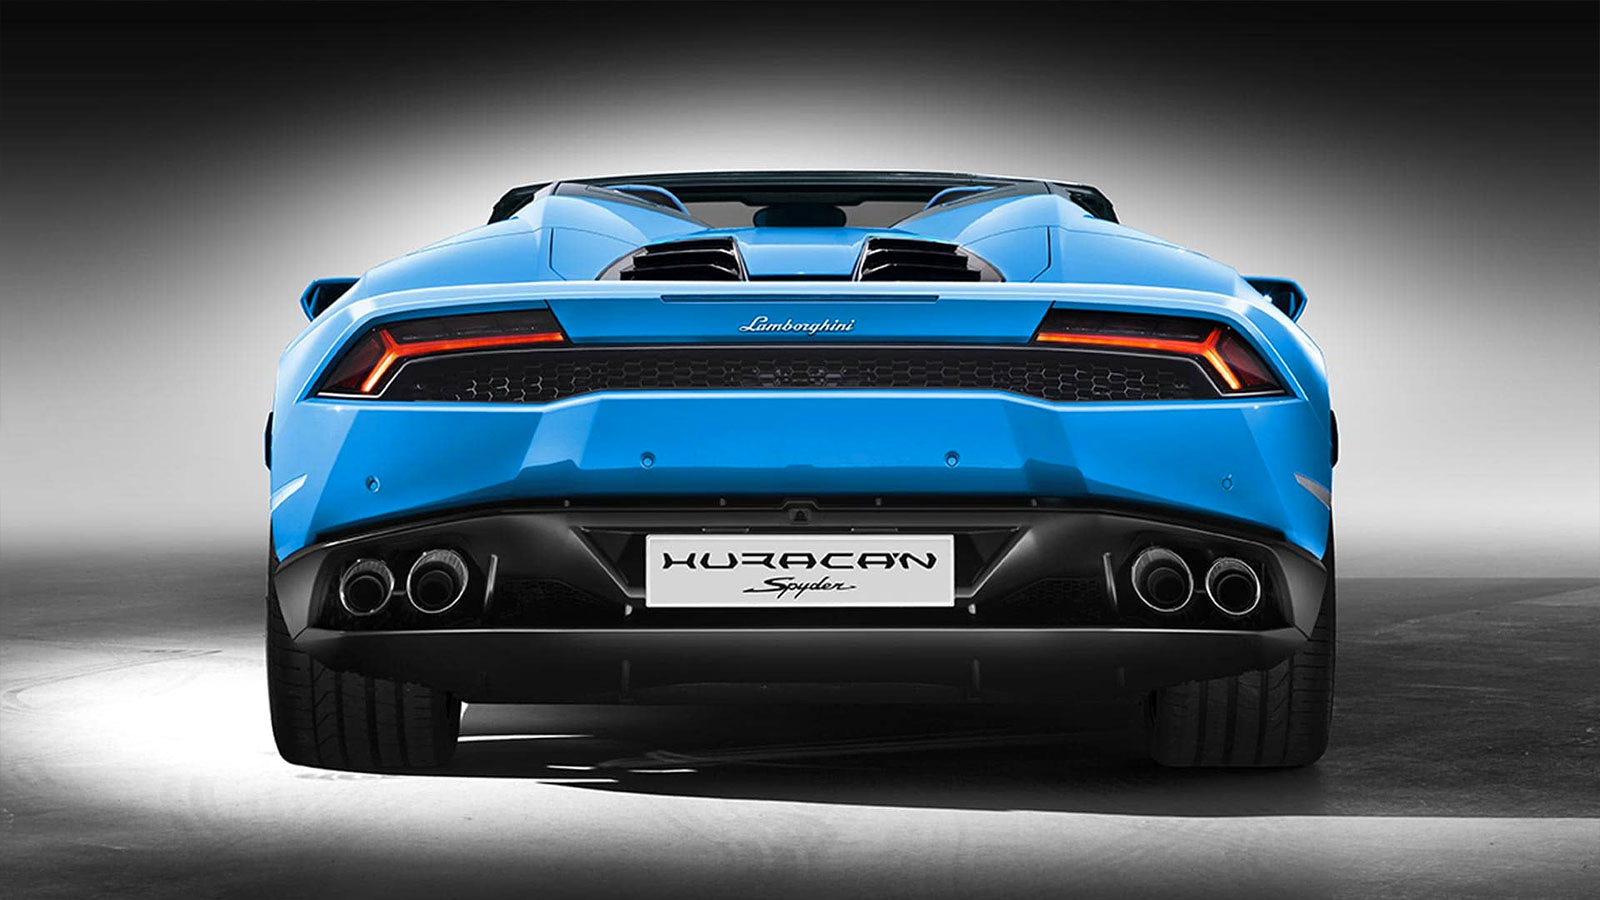 Lamborghini Huracan AWD Spyder - Inspiring Technology image 6